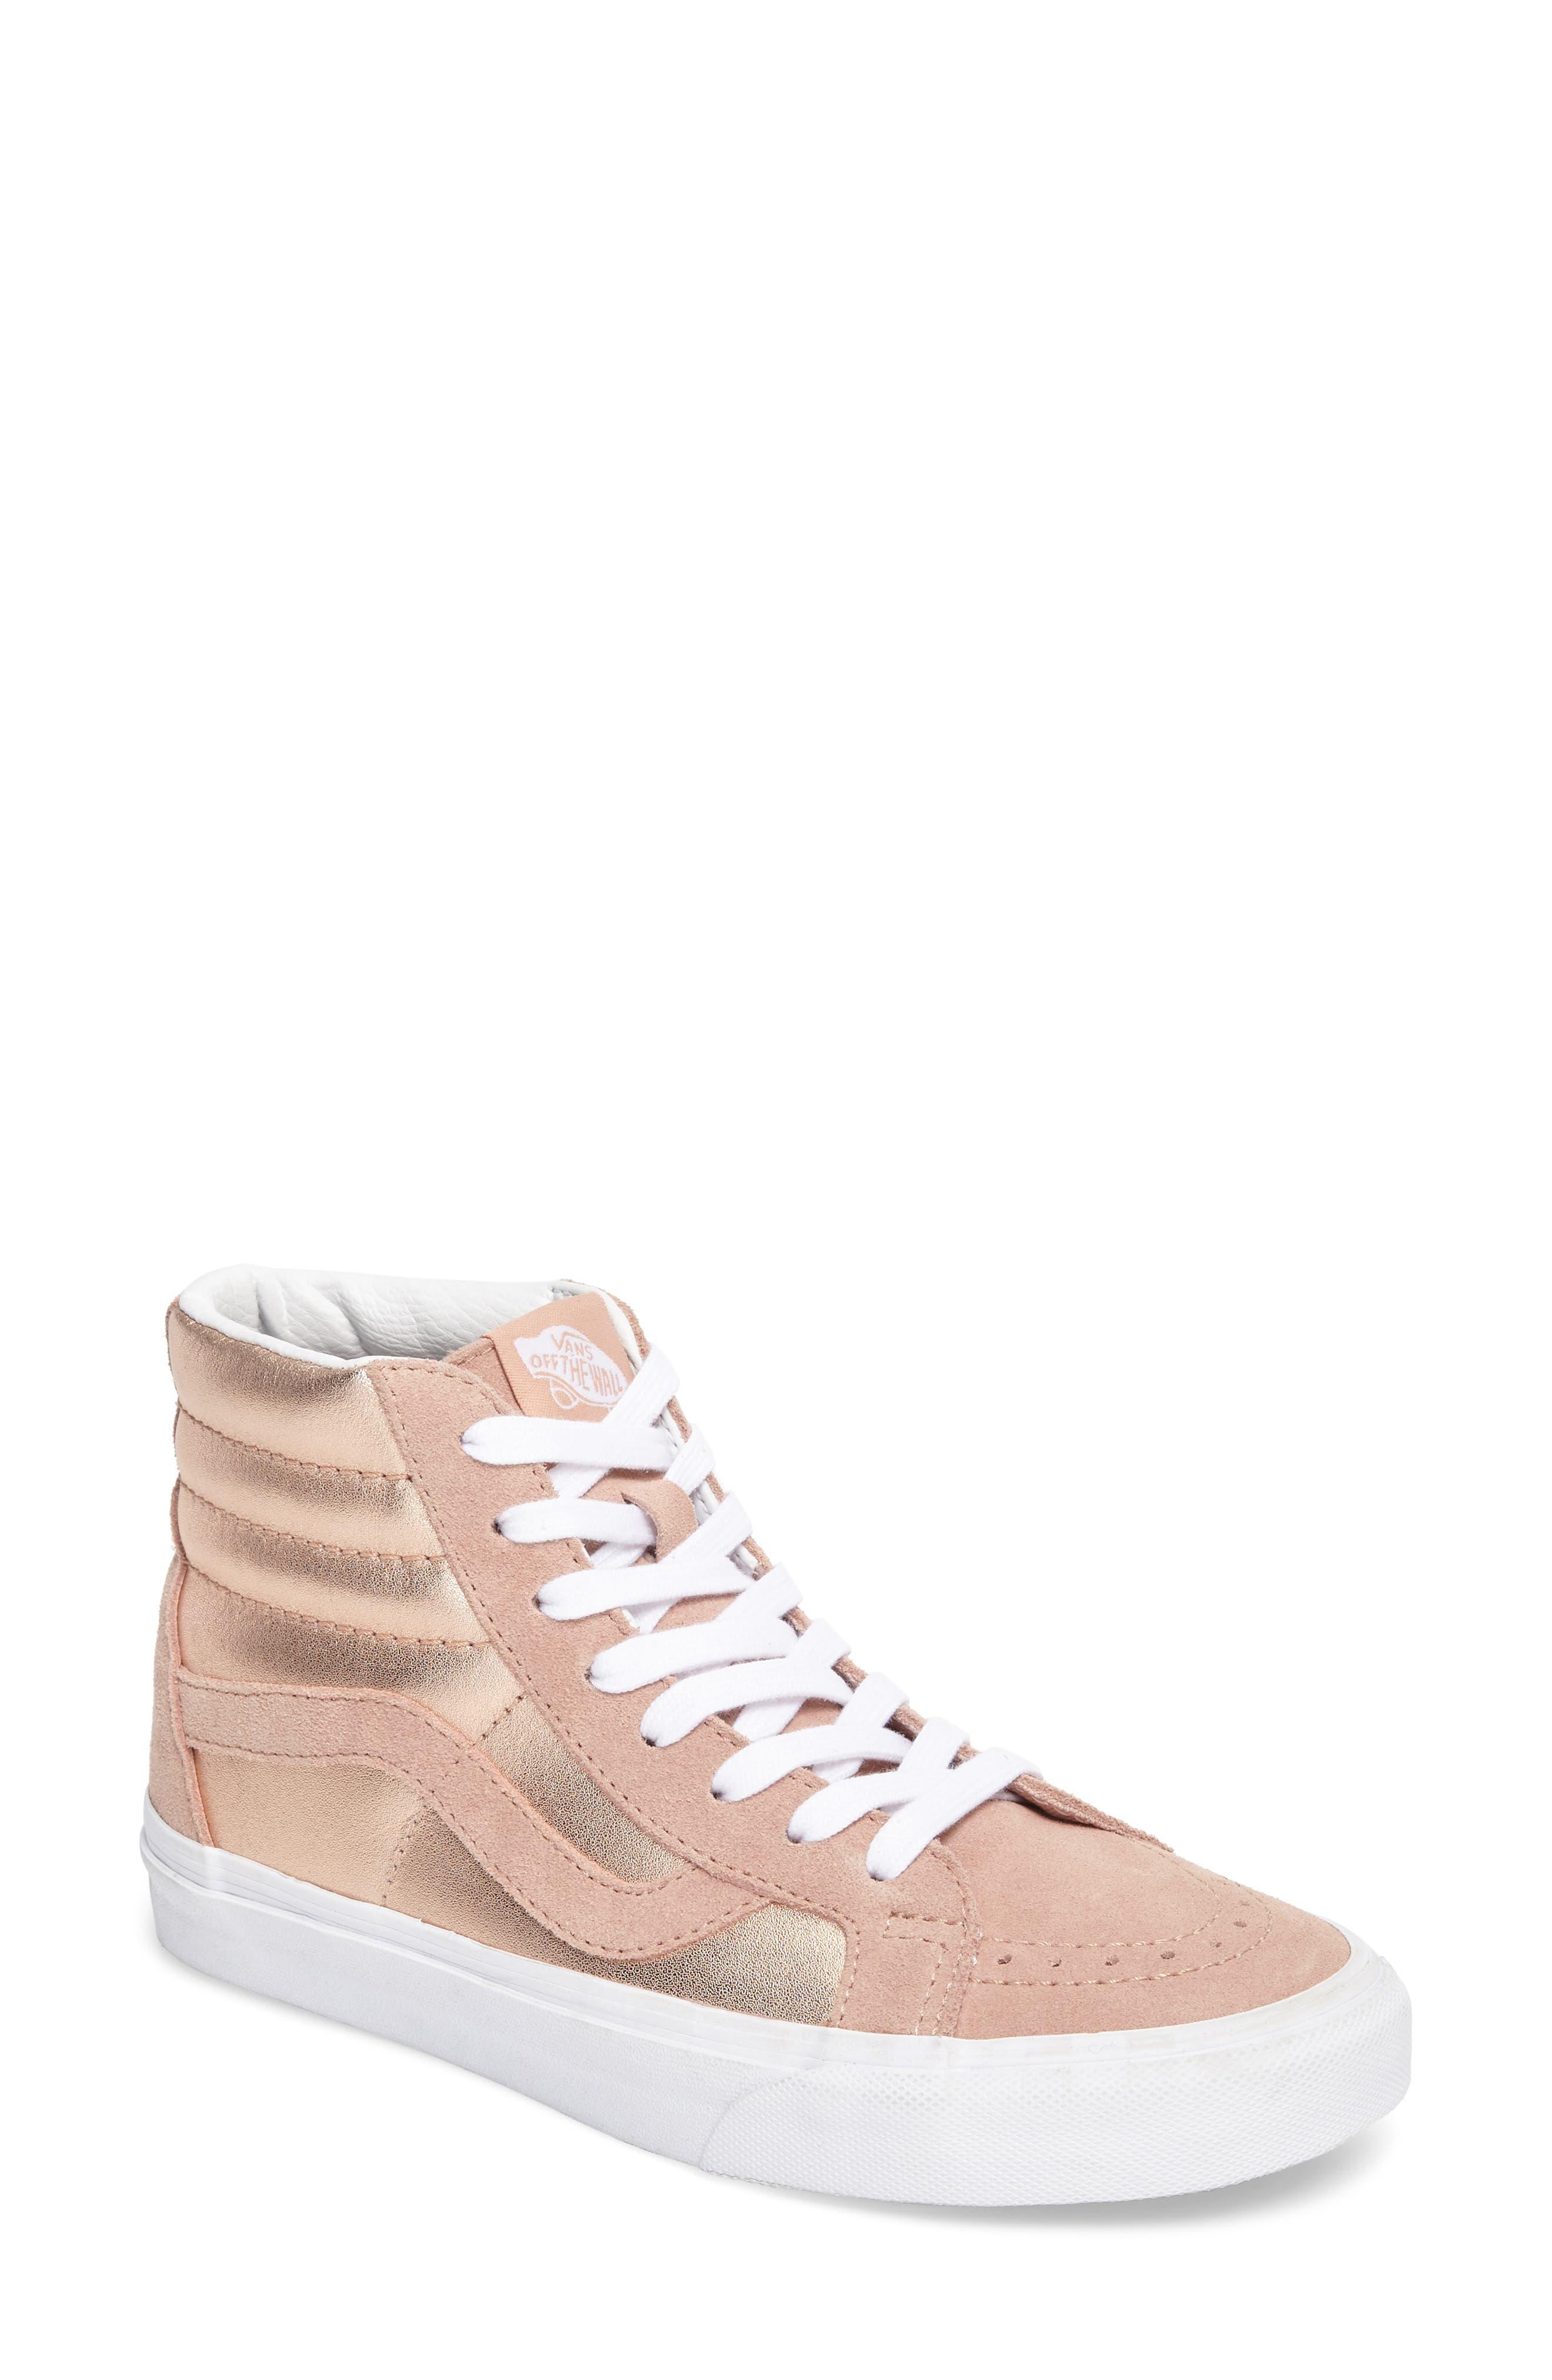 Alternate Image 1 Selected - Vans 'Sk8-Hi Reissue' Sneaker (Women)